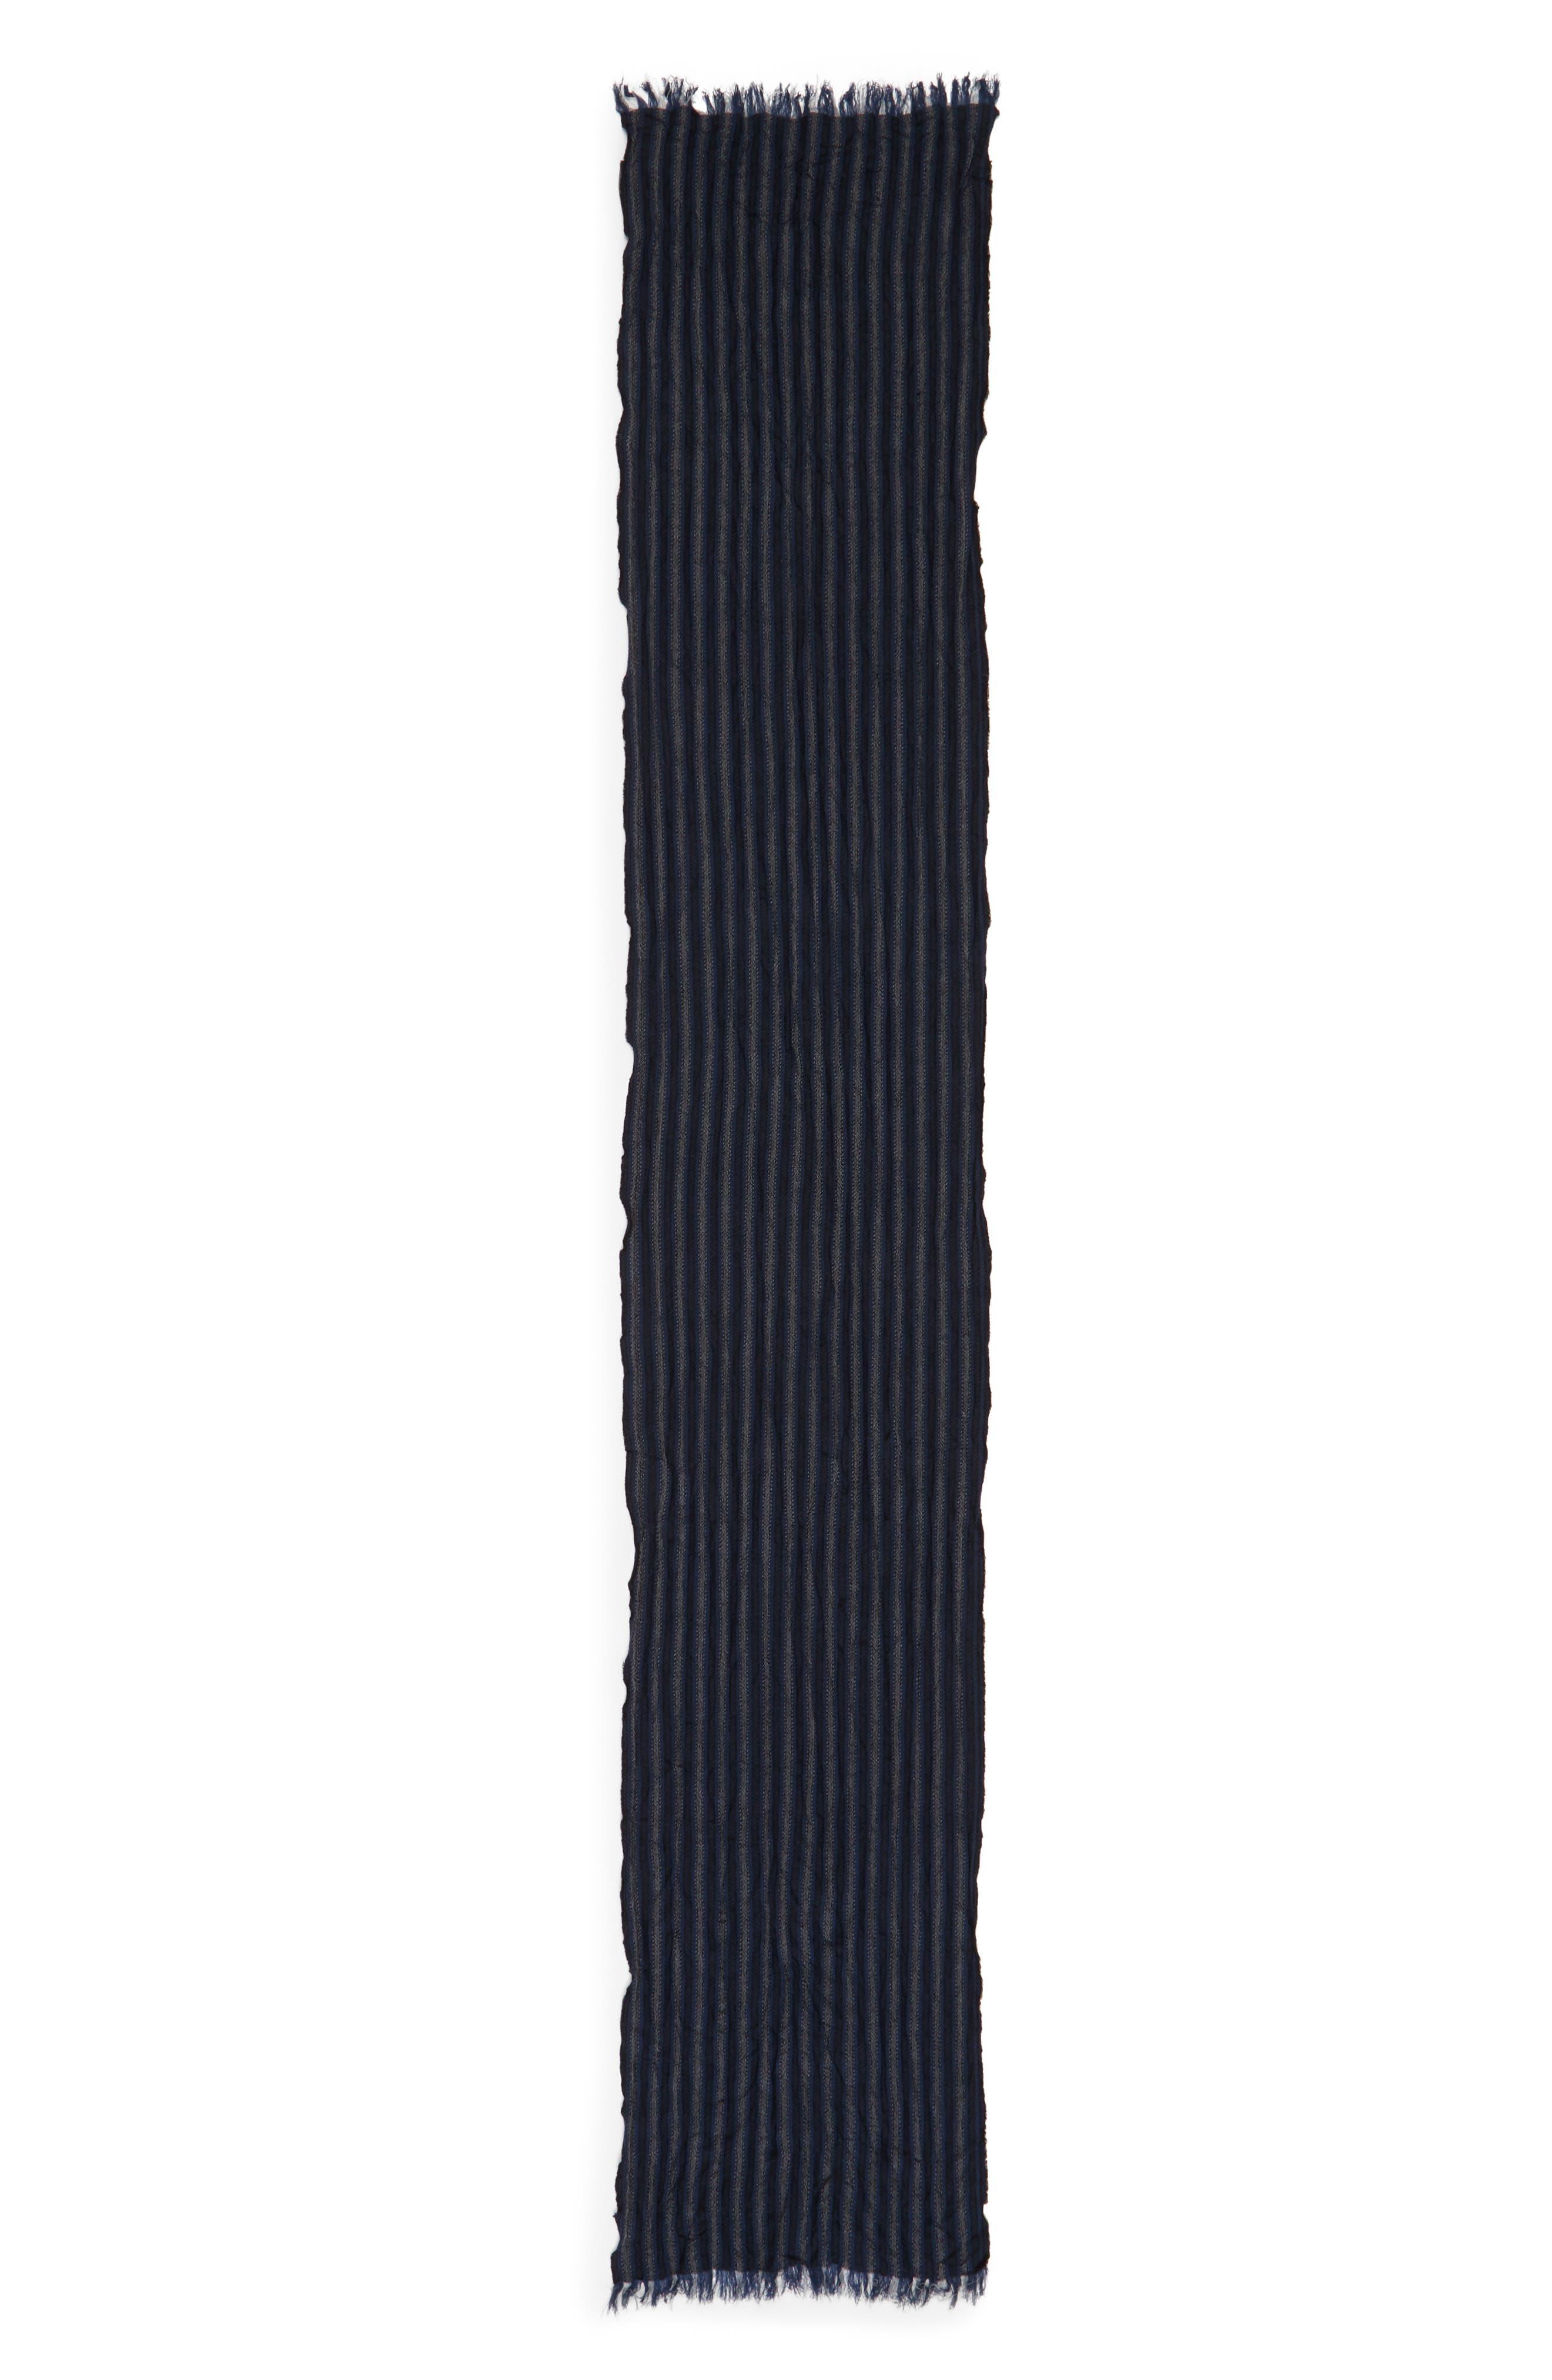 Crinkle Stripe Wool Scarf,                             Alternate thumbnail 2, color,                             Midnight Navy